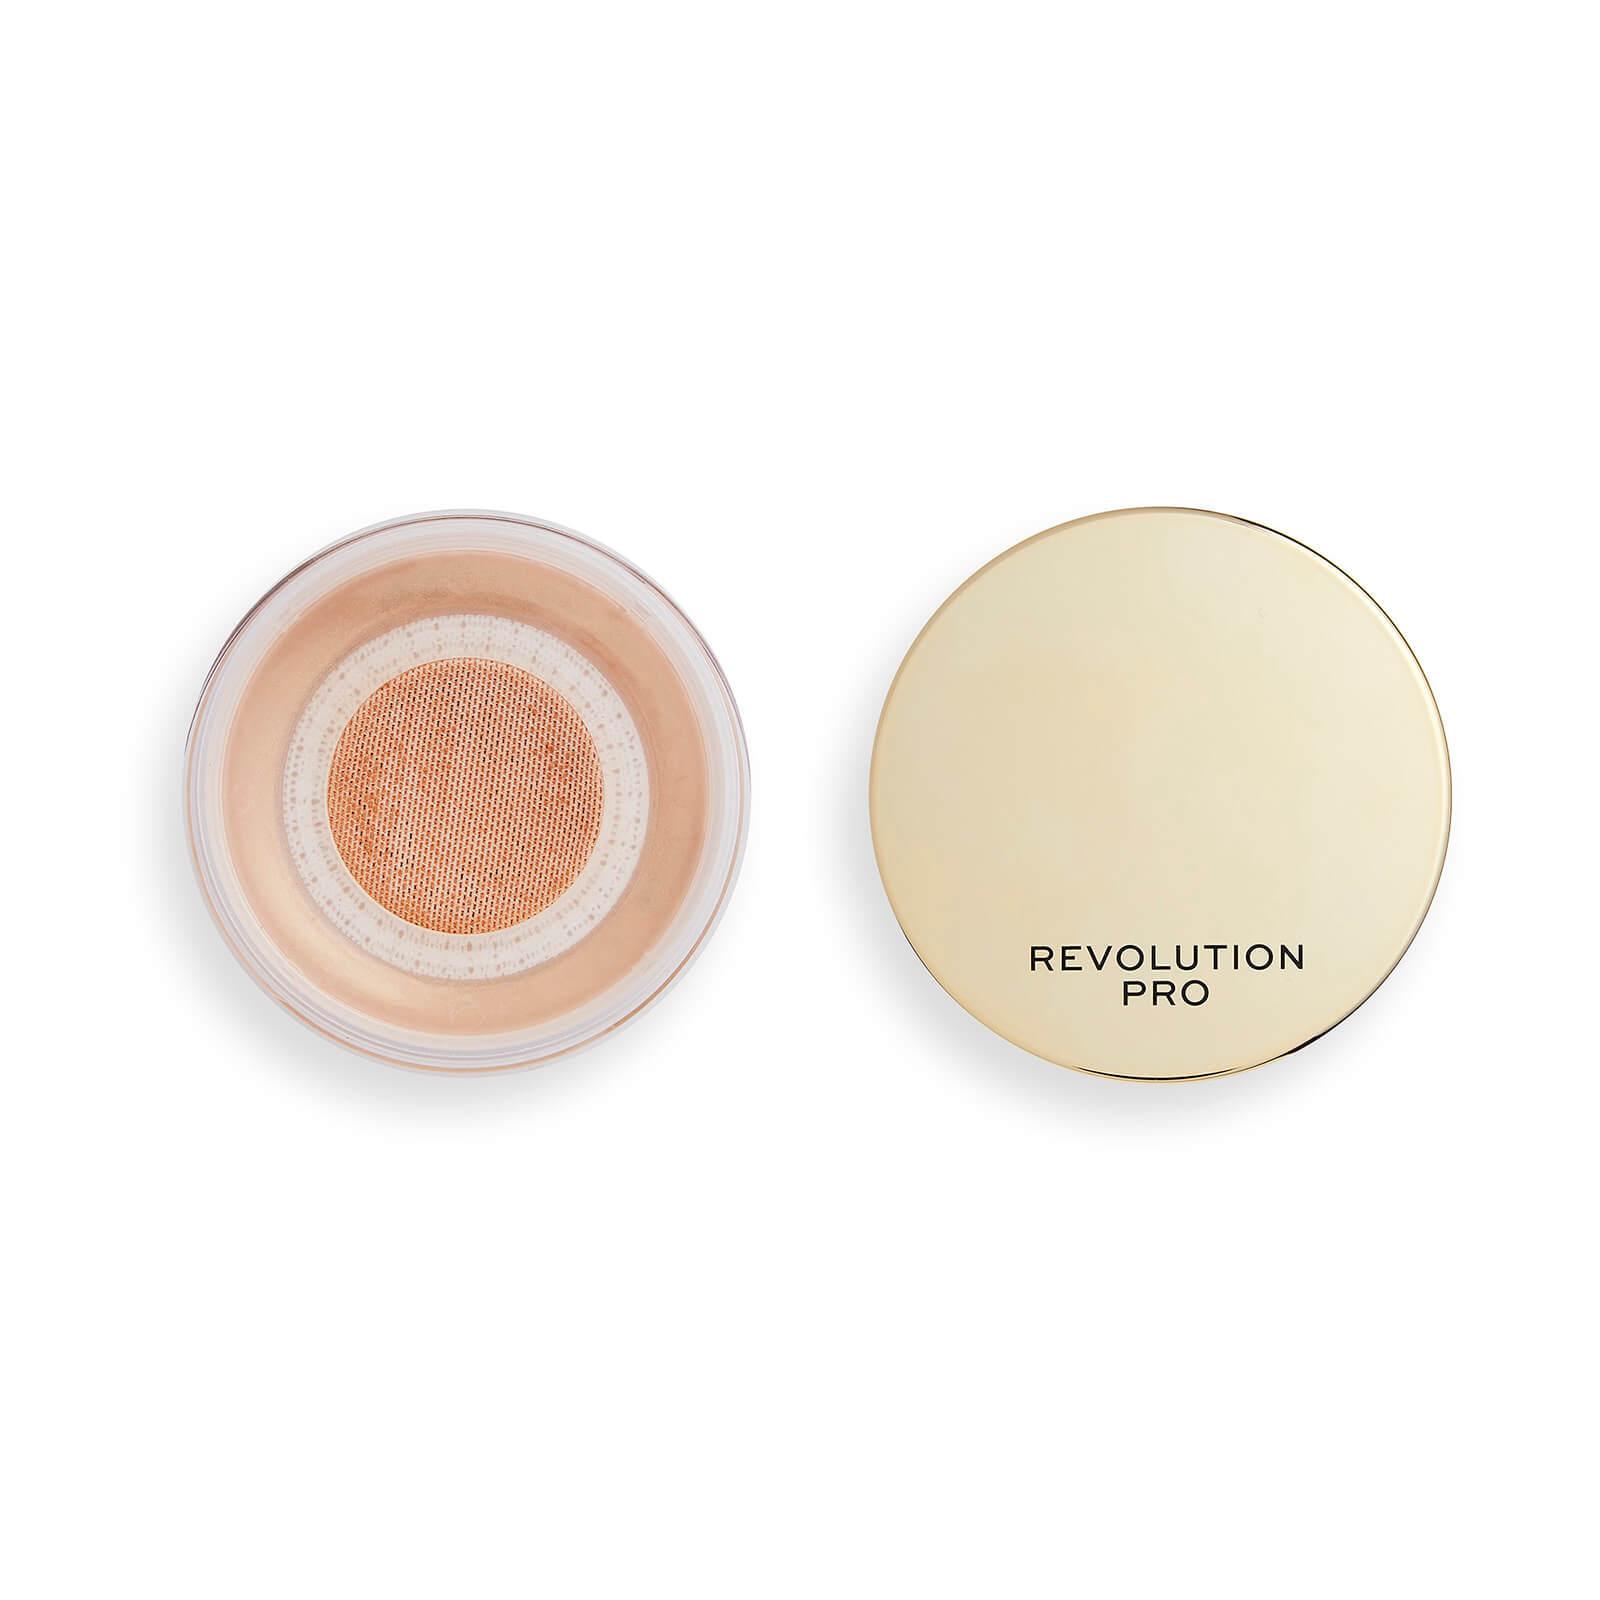 Купить Revolution Pro Goddess Glow Finishing Powder - Splendour 6g